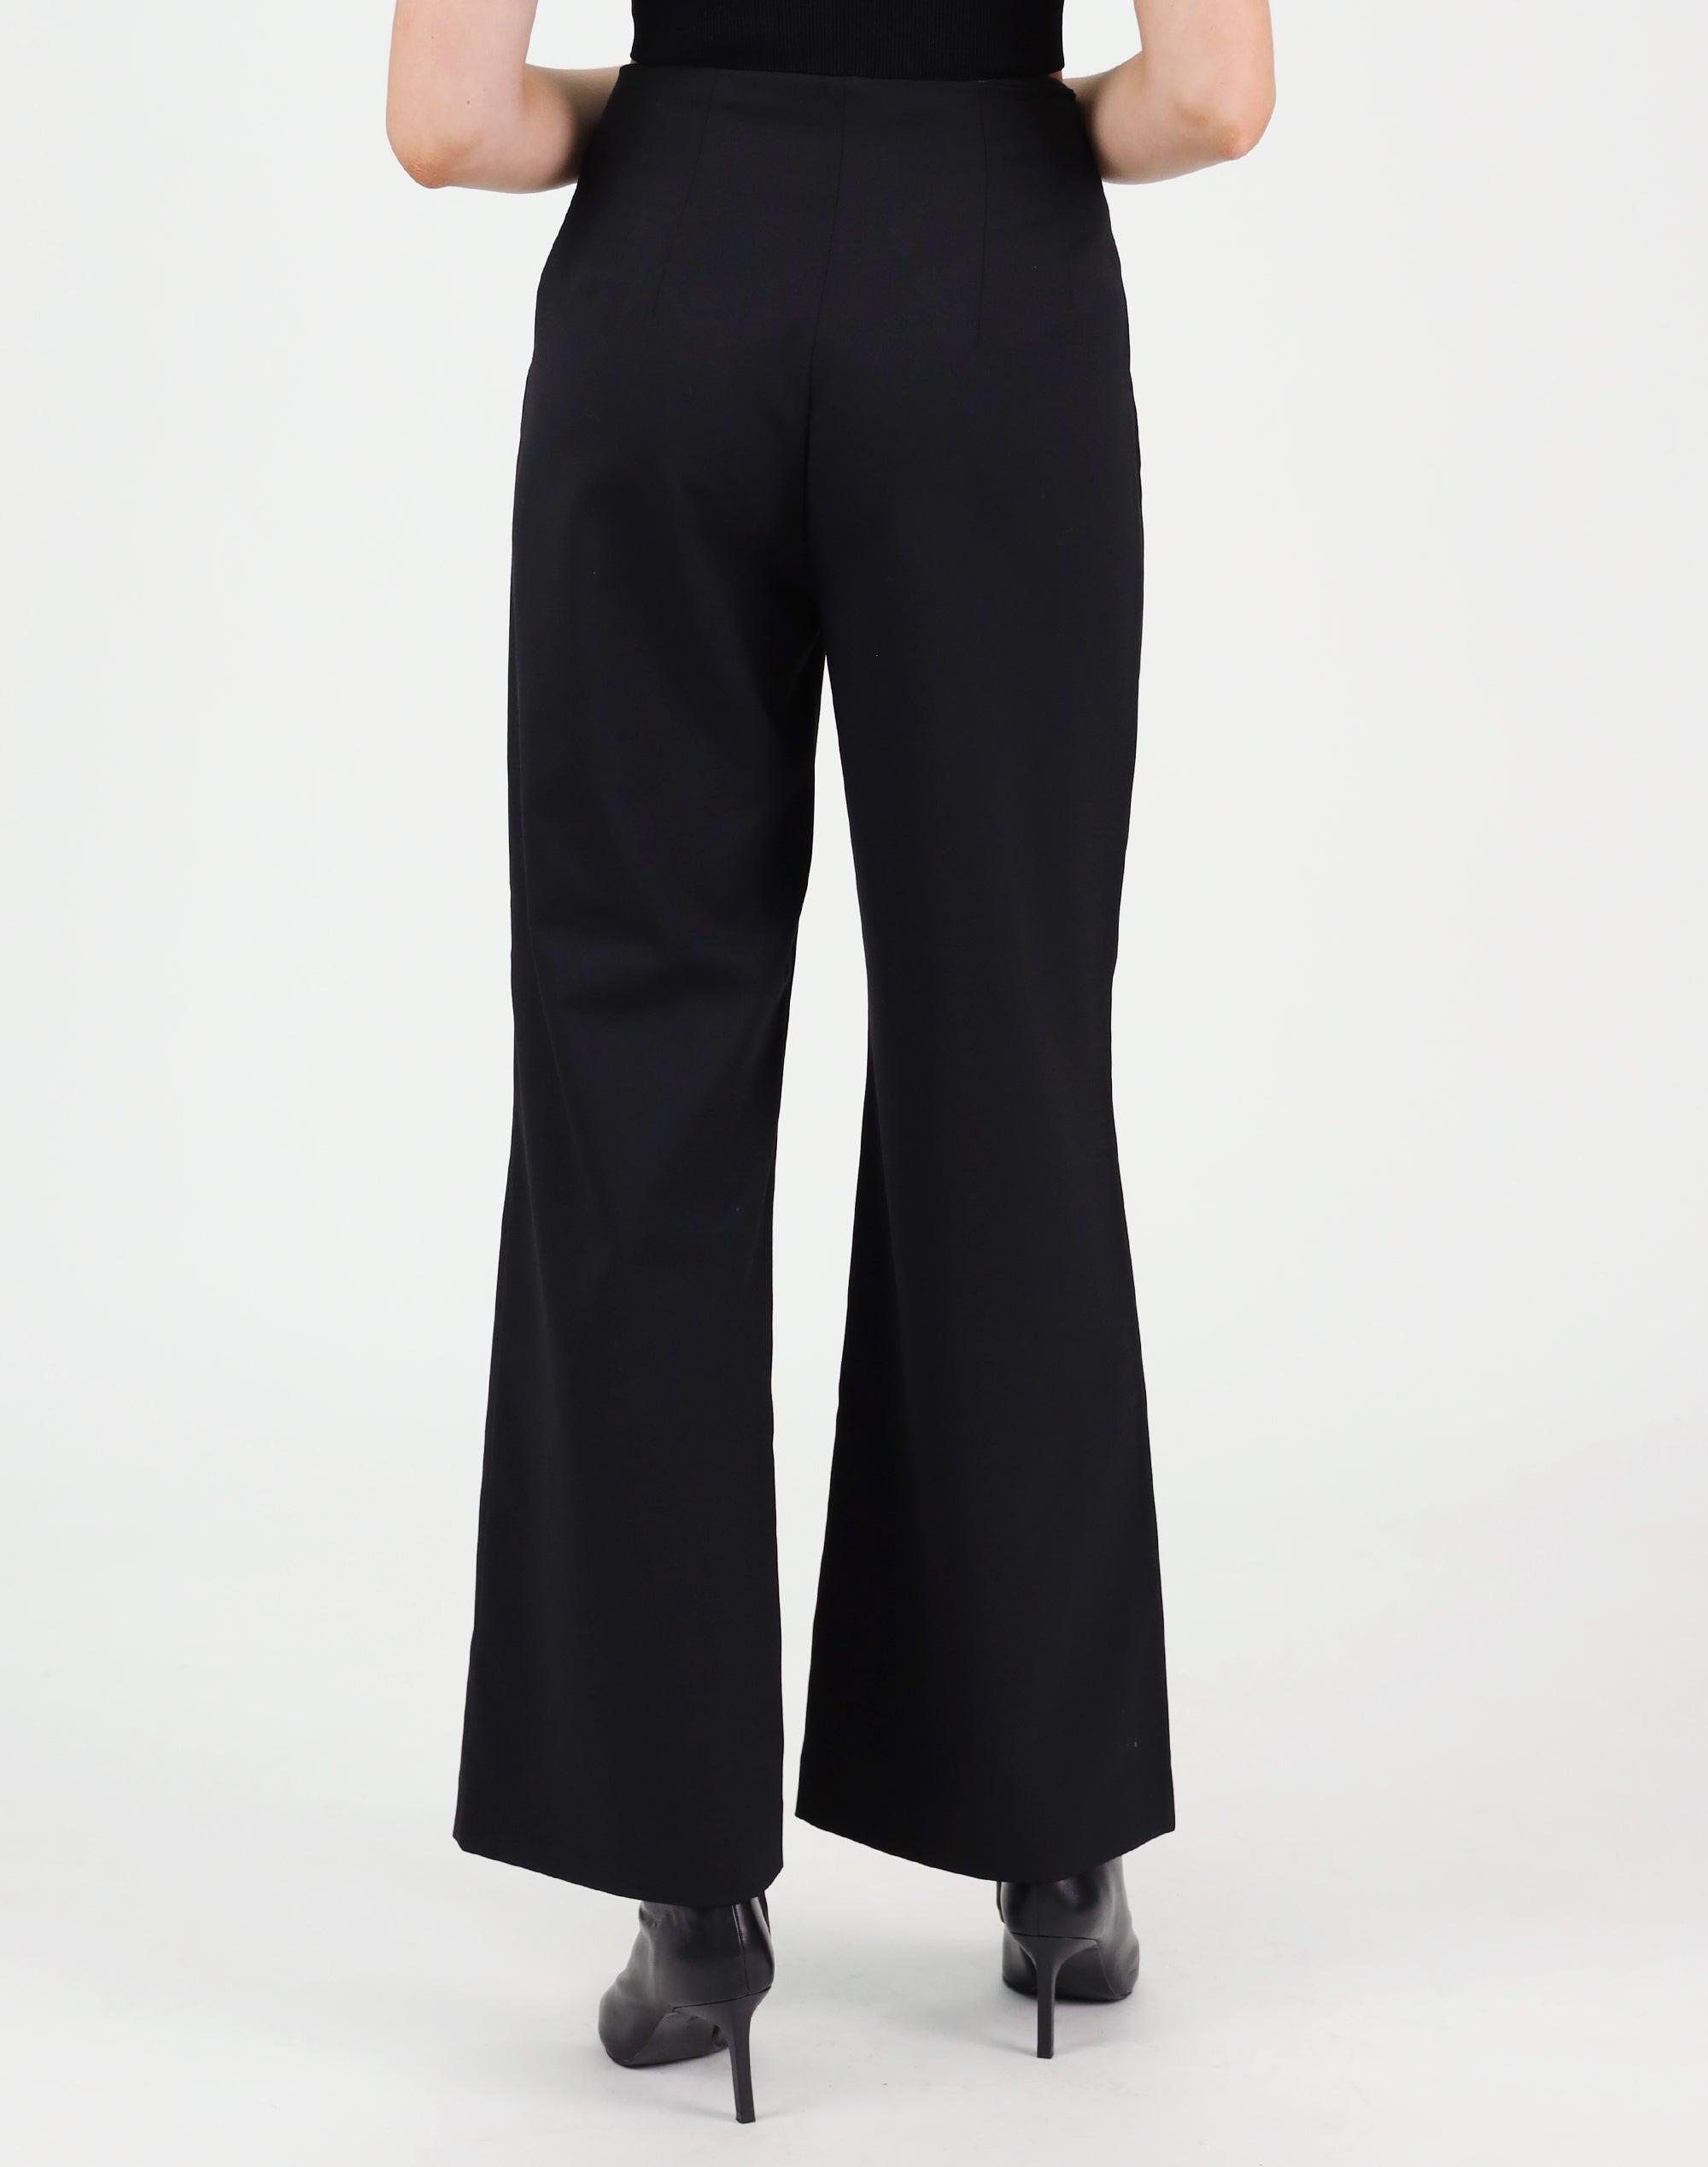 Wool Mix Wide Leg Pant